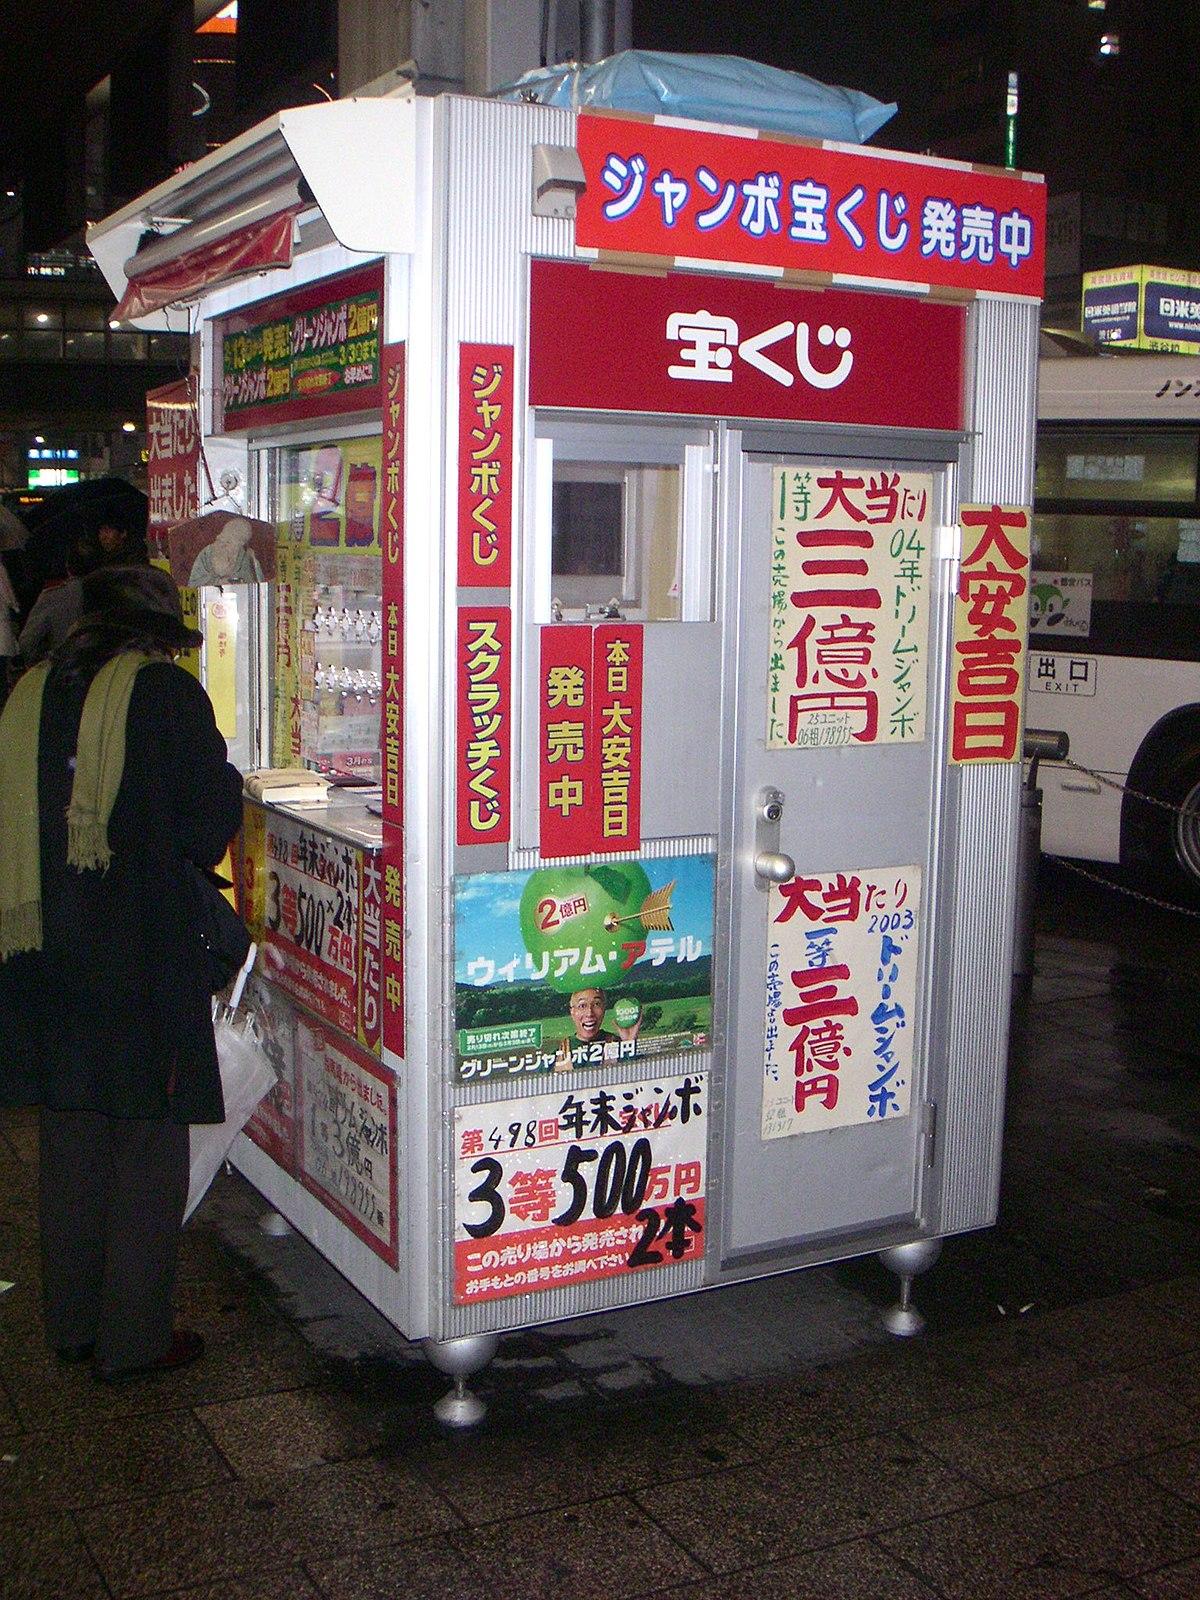 Public lottery stall, East entrance, Shibuya Station, Tokyo, 20060220.jpg